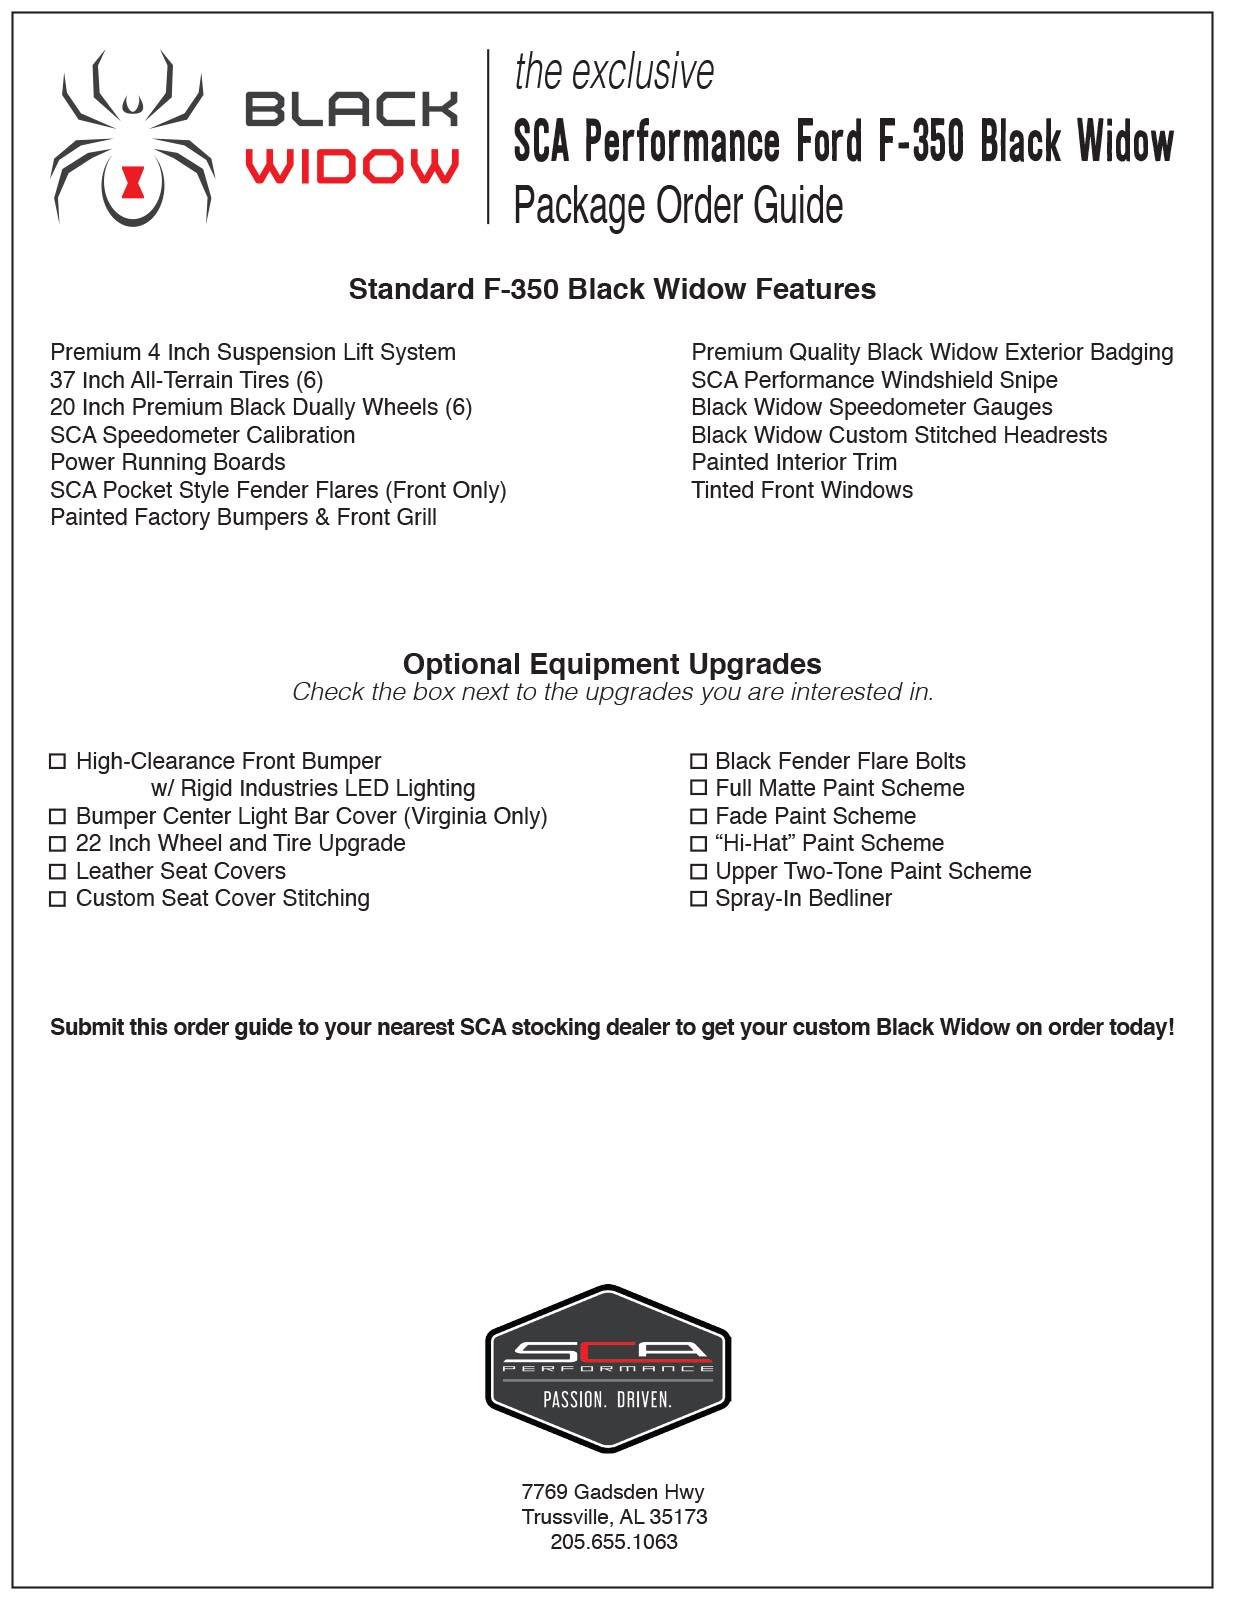 Ford F350 Black Widow Order Guide.jpg